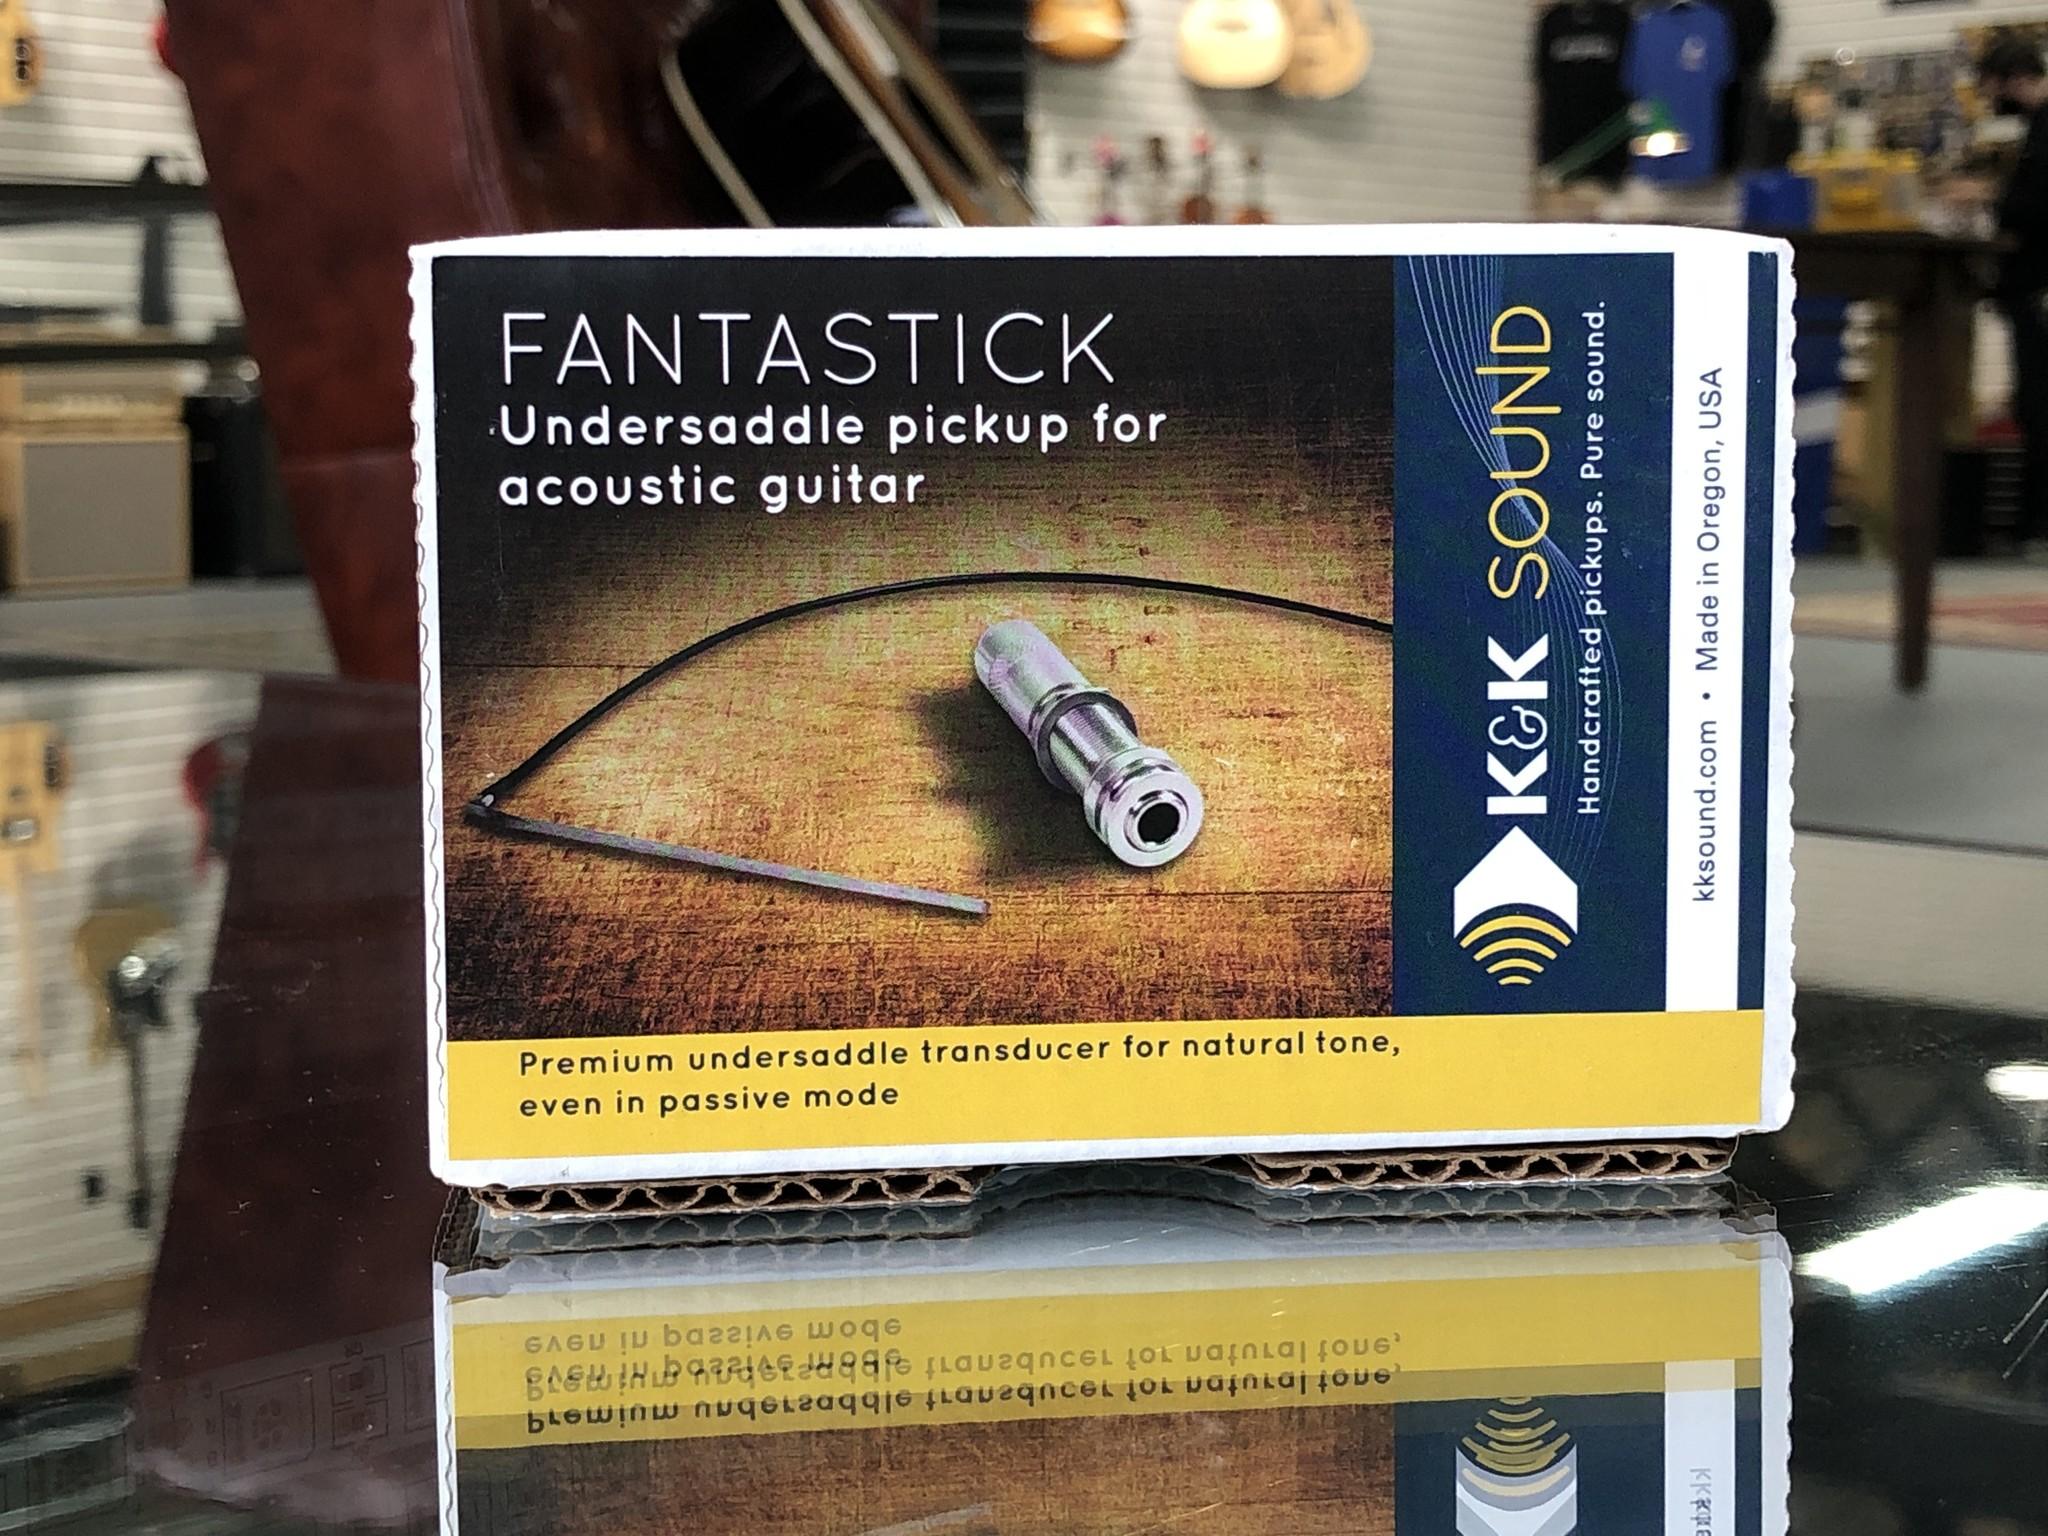 K&K FanTaStick Undersaddle Transducer-1